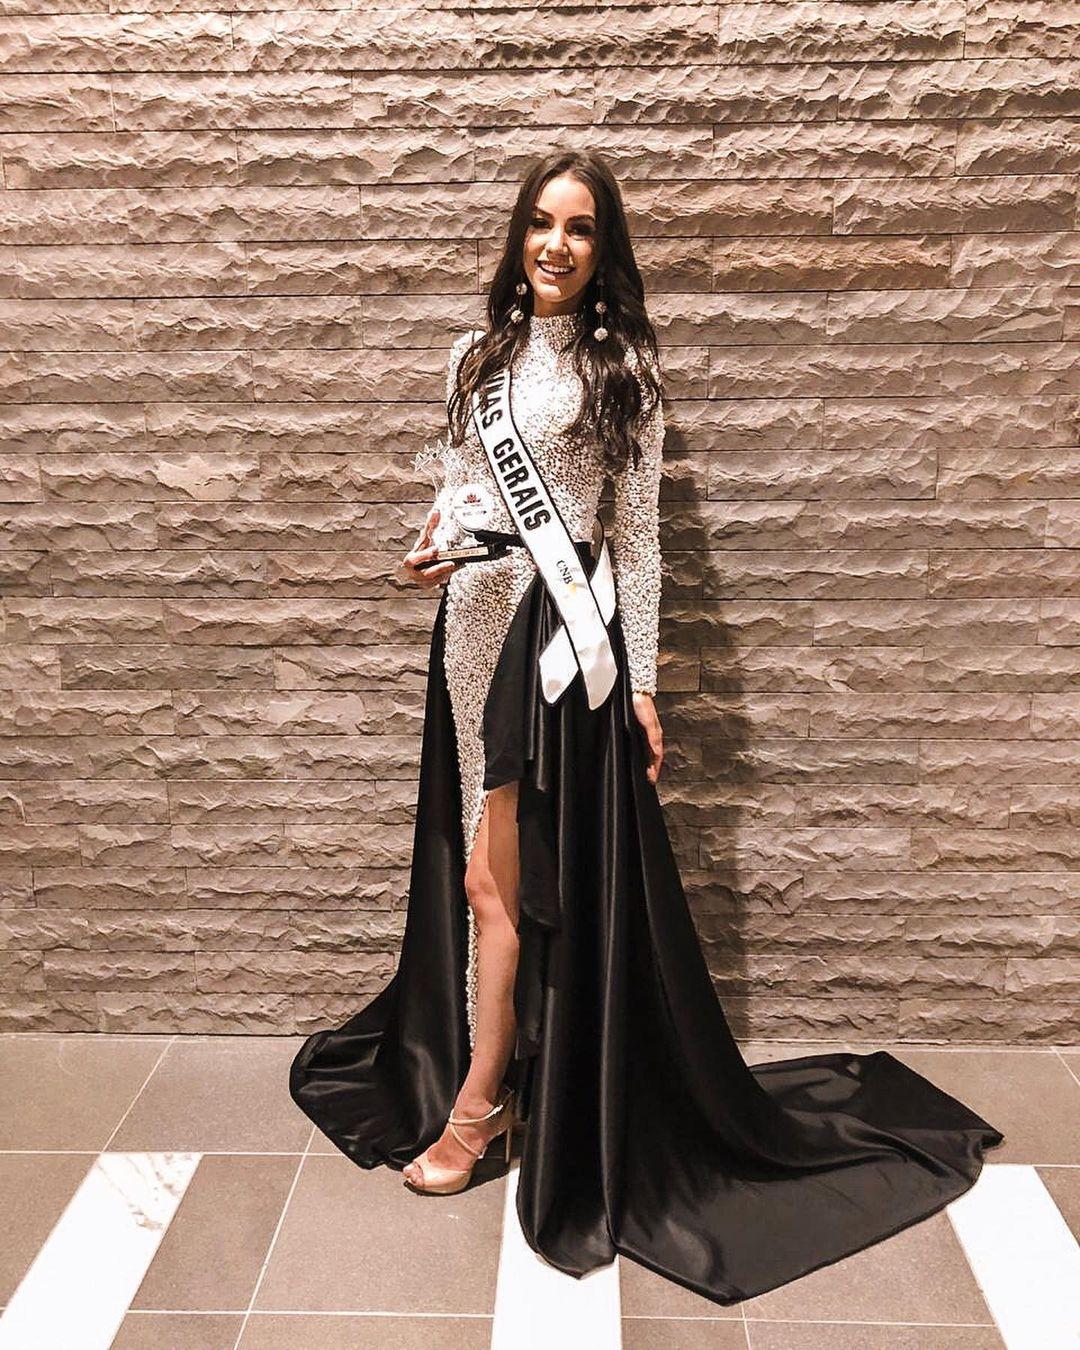 rafaella felipe, top 20 de miss brasil mundo 2019. - Página 10 67891711